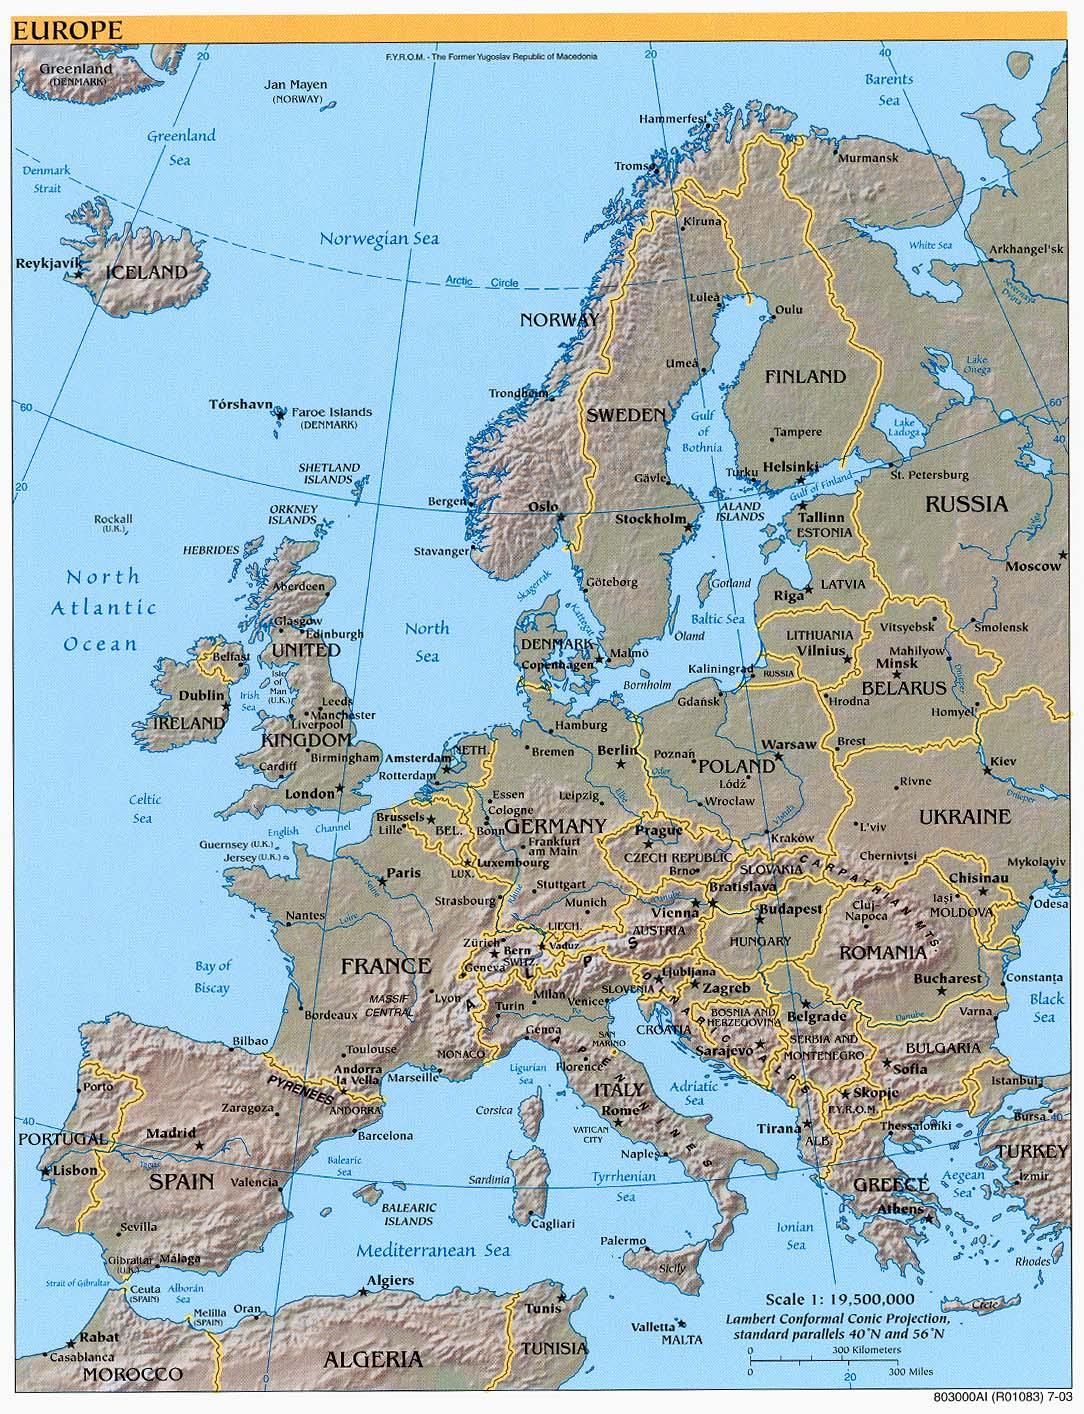 download free europe maps